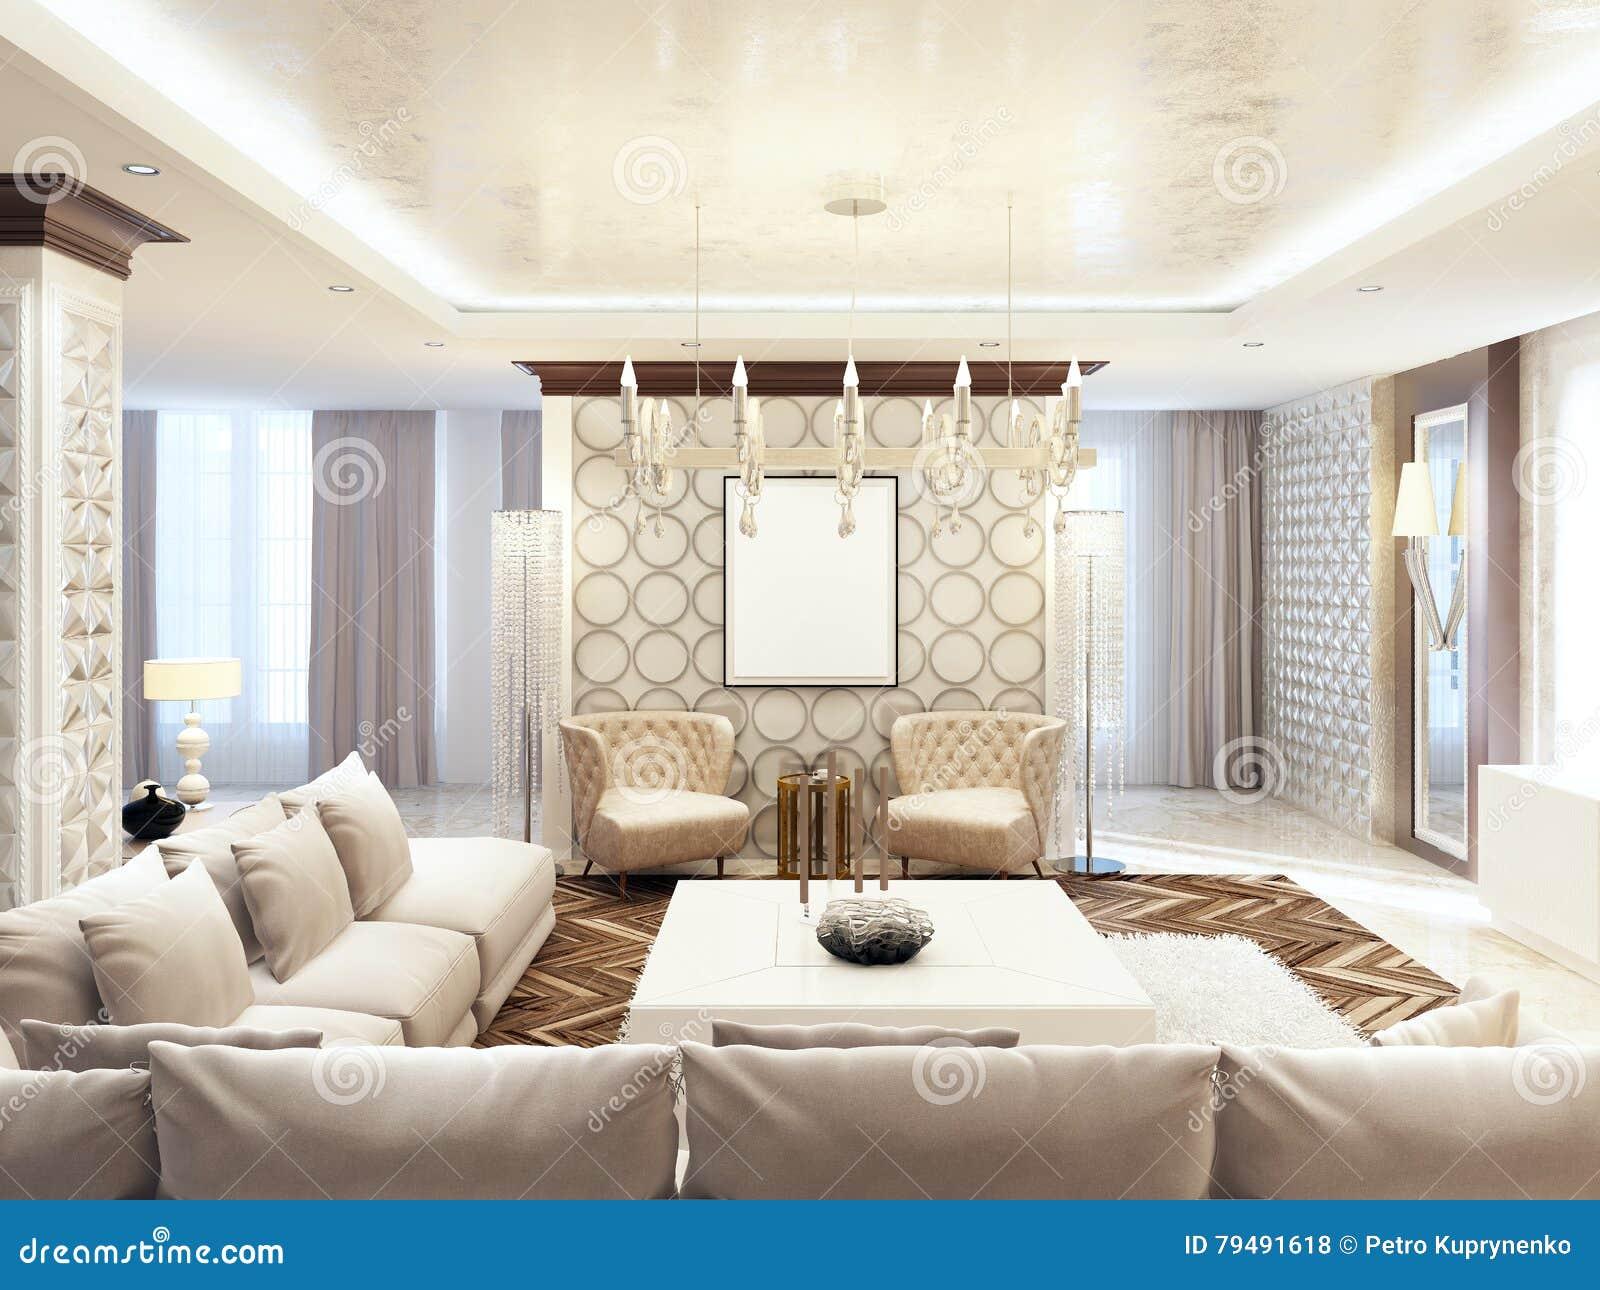 Decoration Style Art Deco luxurious large living room style art deco. stock illustration